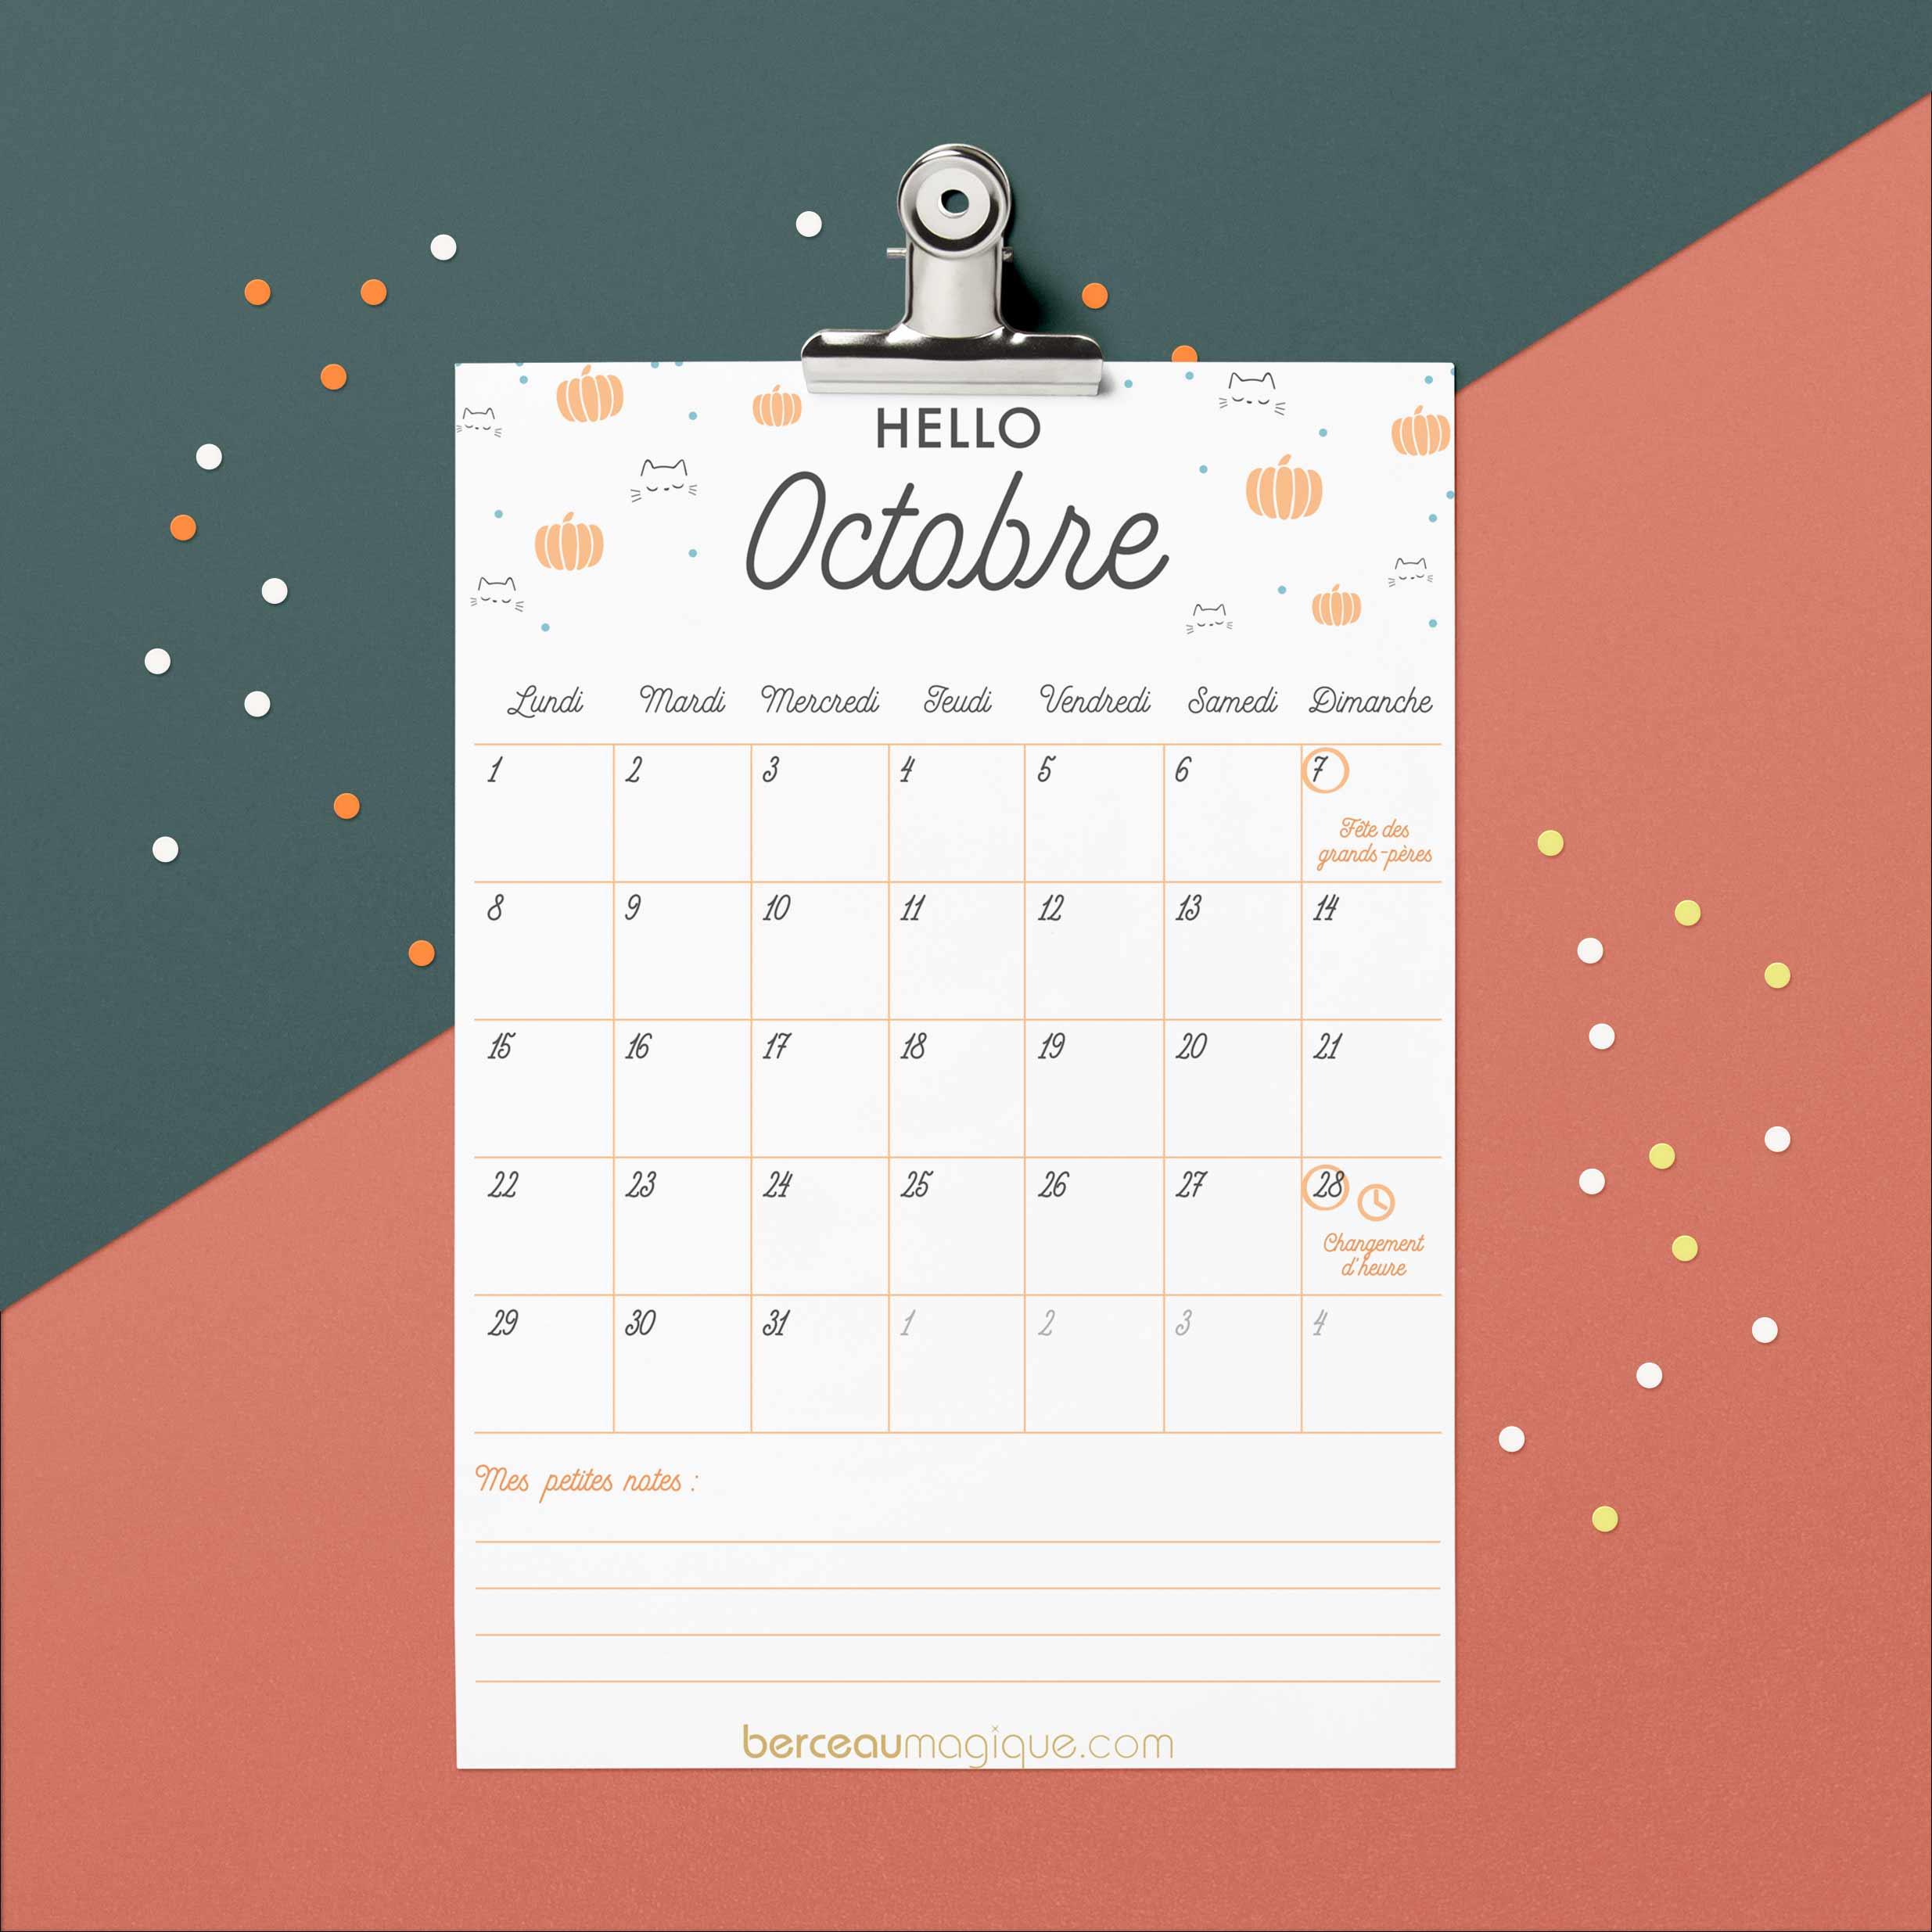 Free Printable : Calendrier D'octobre 2018 | Berceau Magique - Free Printable Images